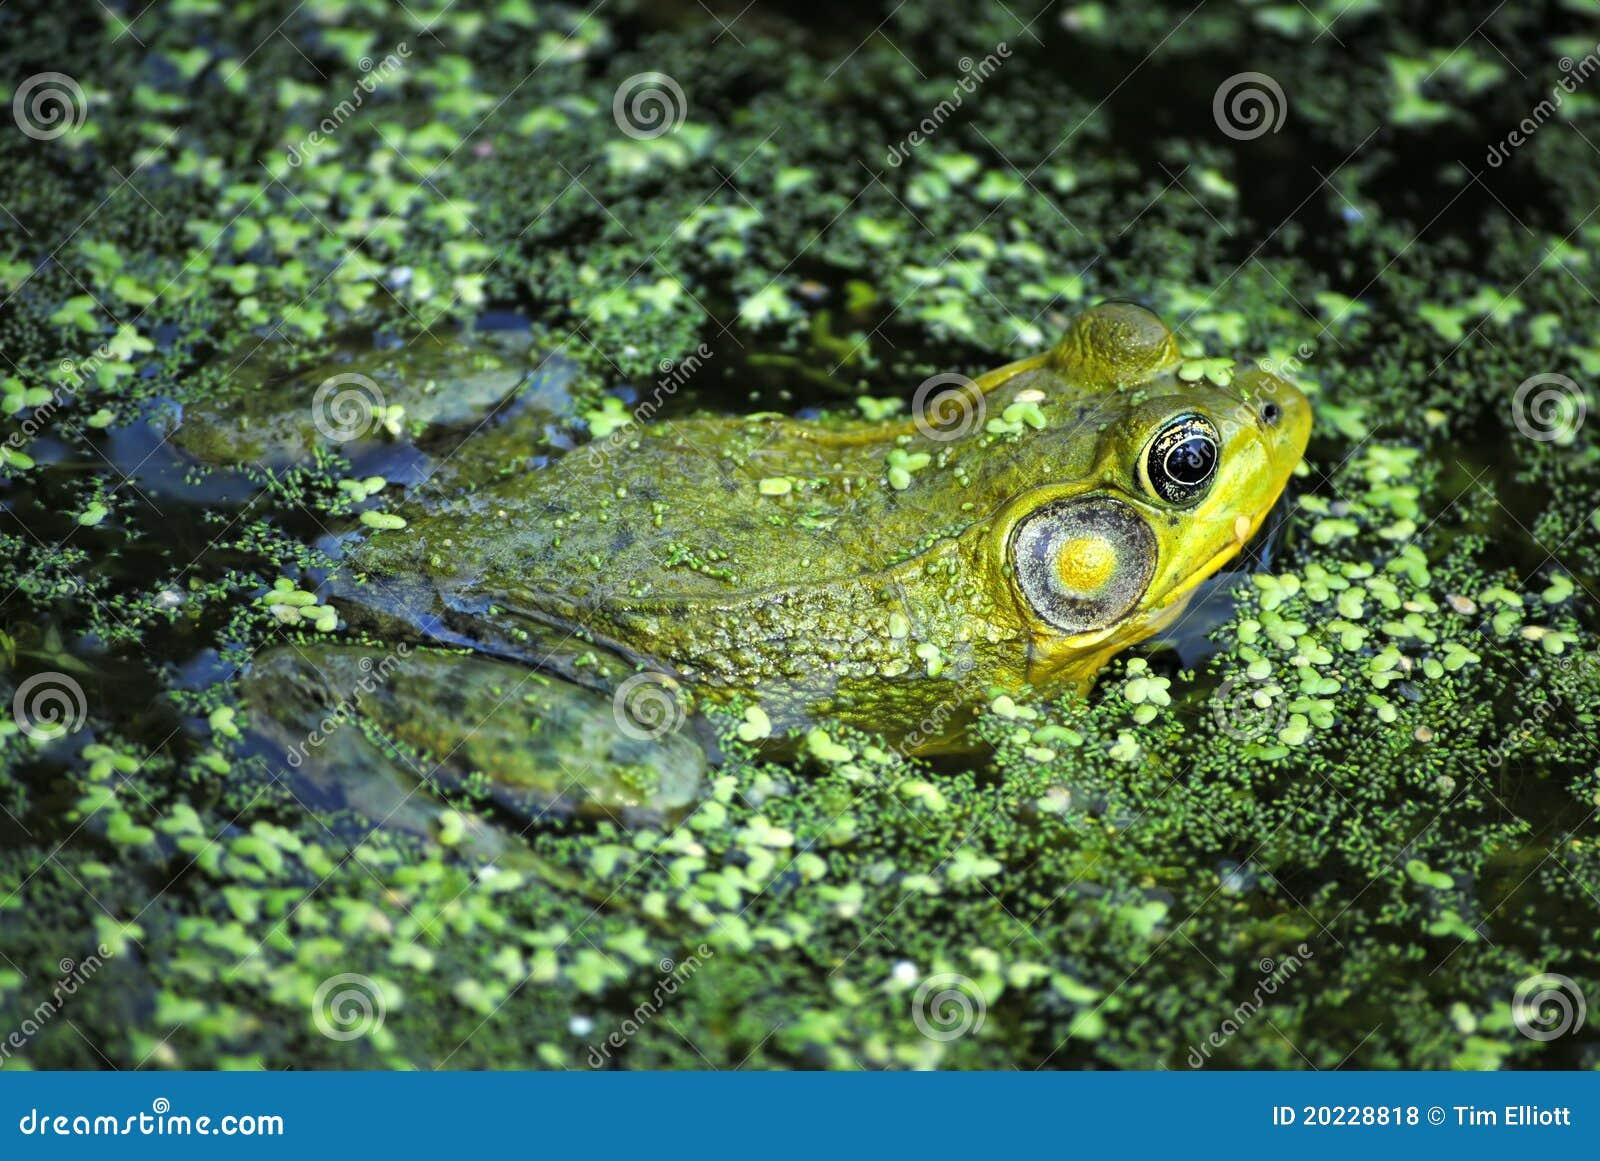 Рана pipiens леопарда лягушки северная